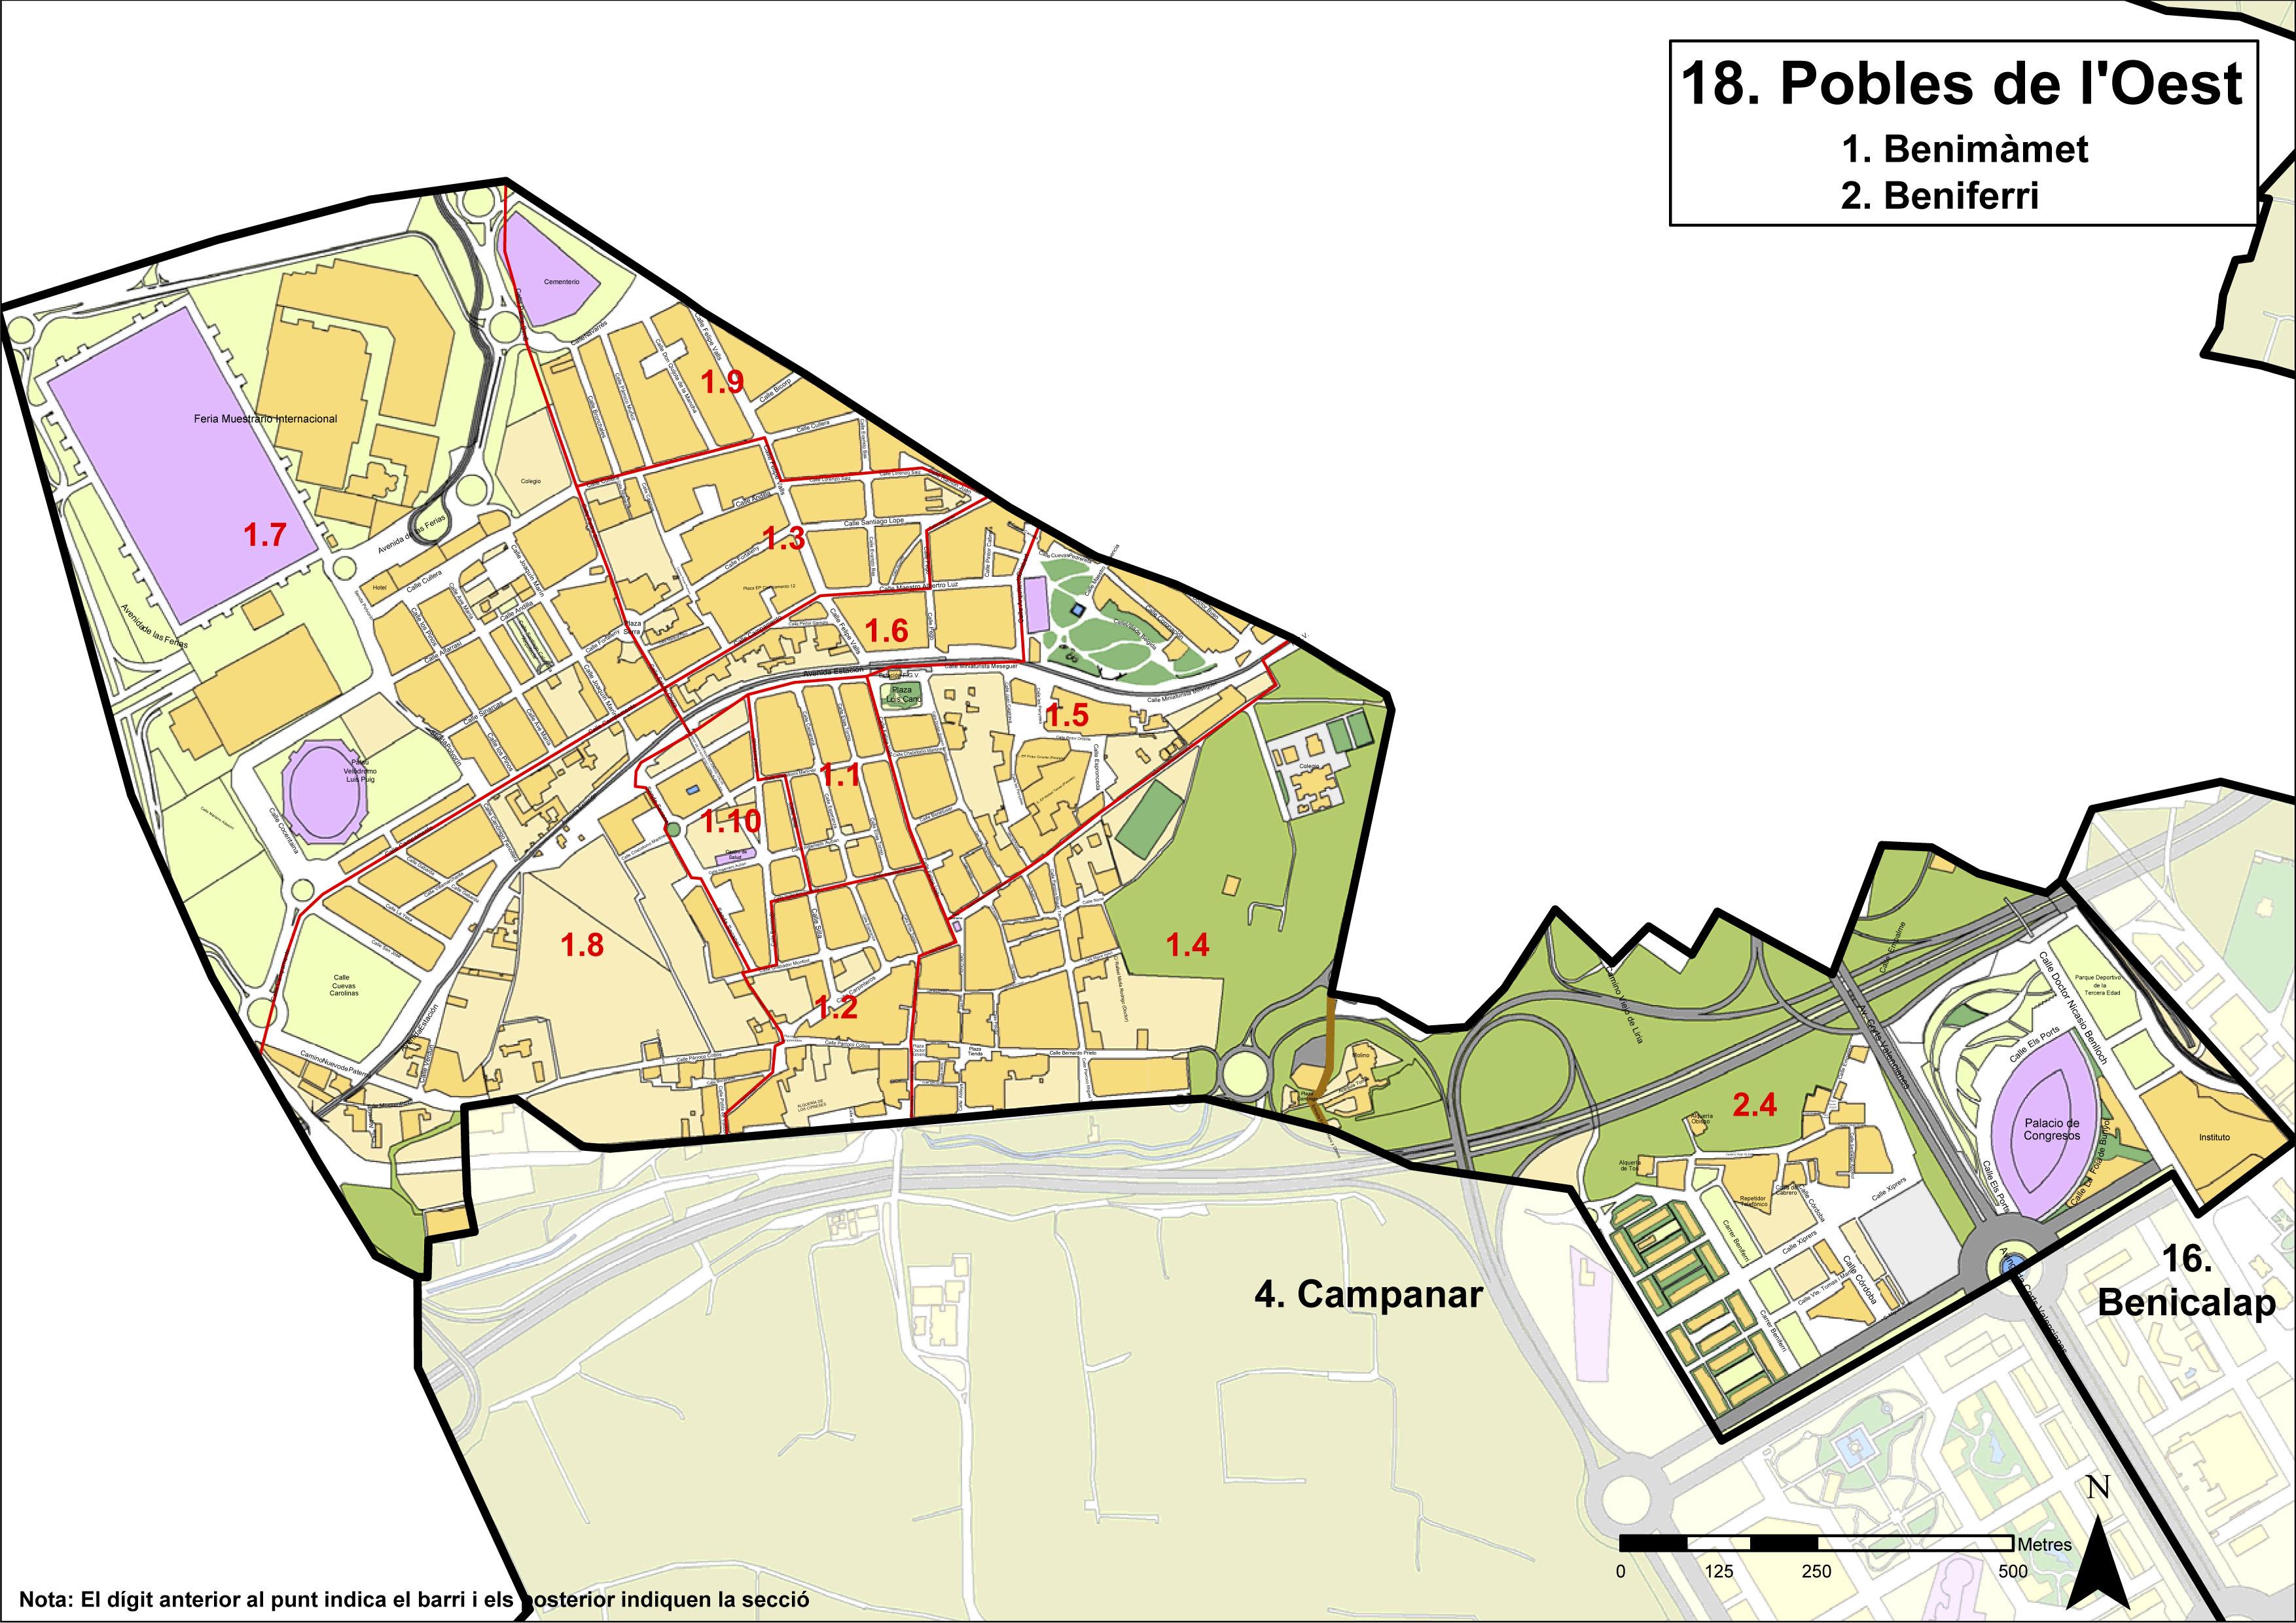 Poblats de l'Oest district, Valencia